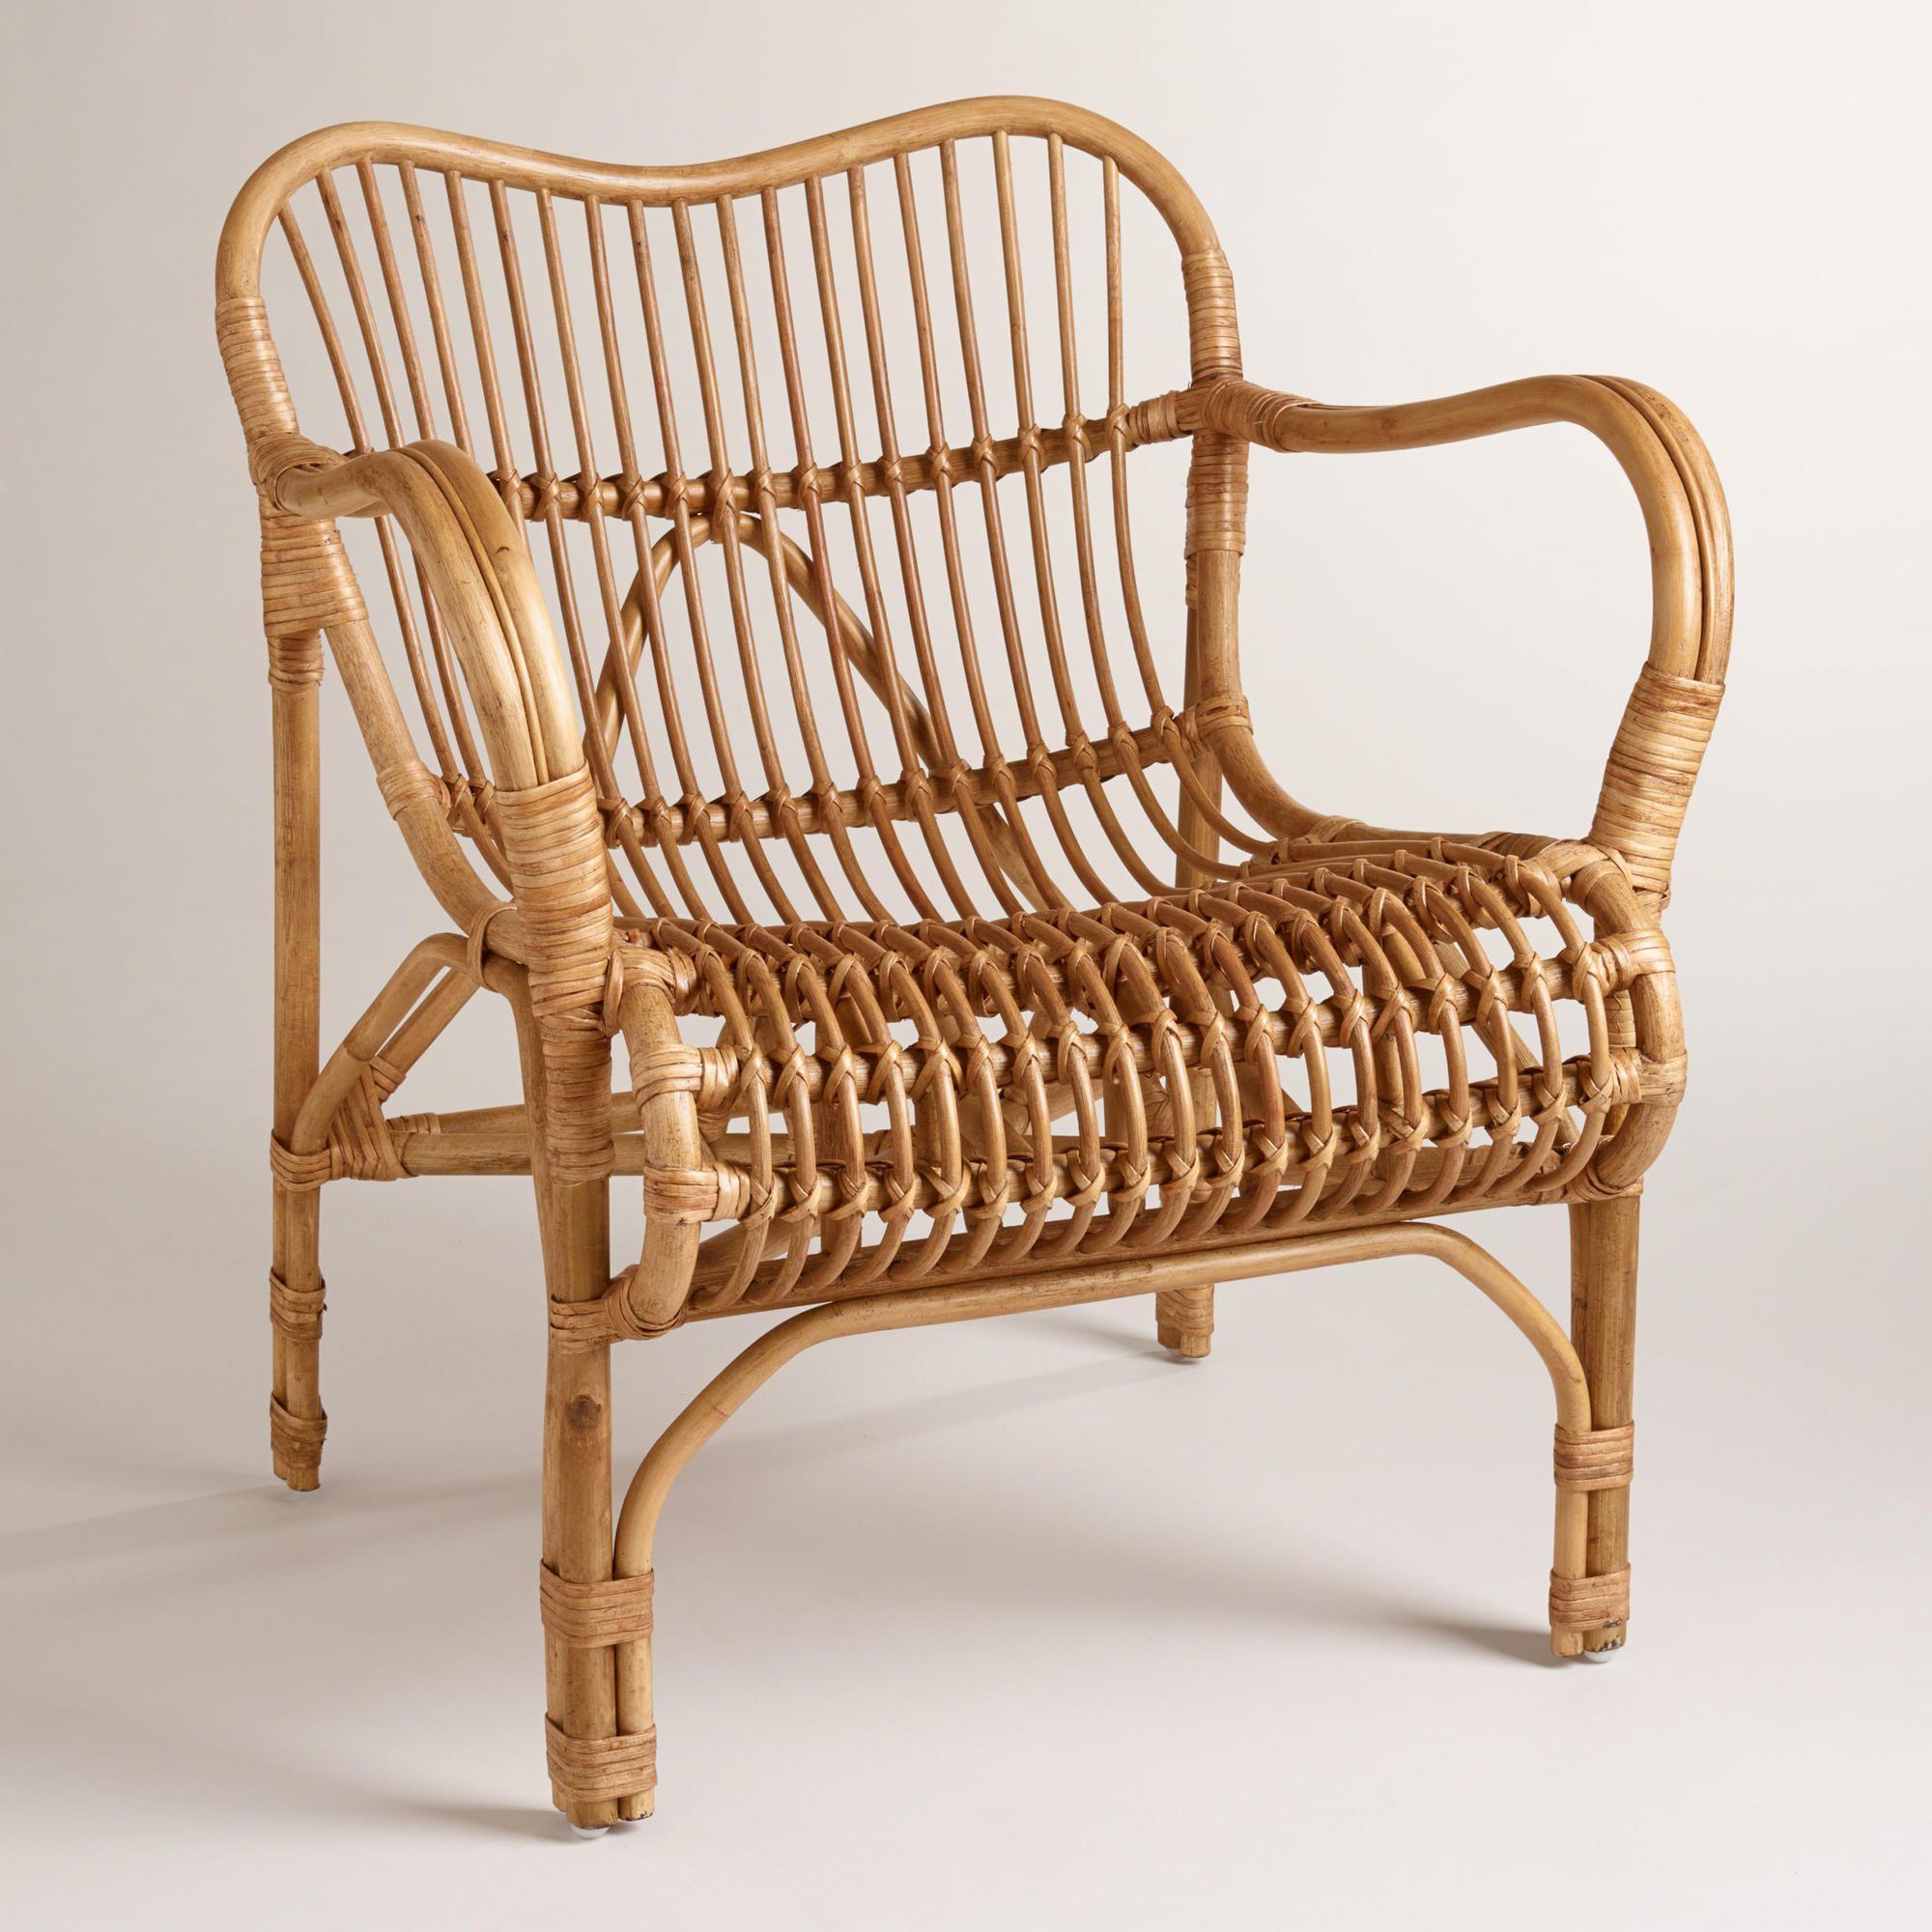 Preferred Bamboo Chairs For Sale &AT84  Advancedmassagebysara